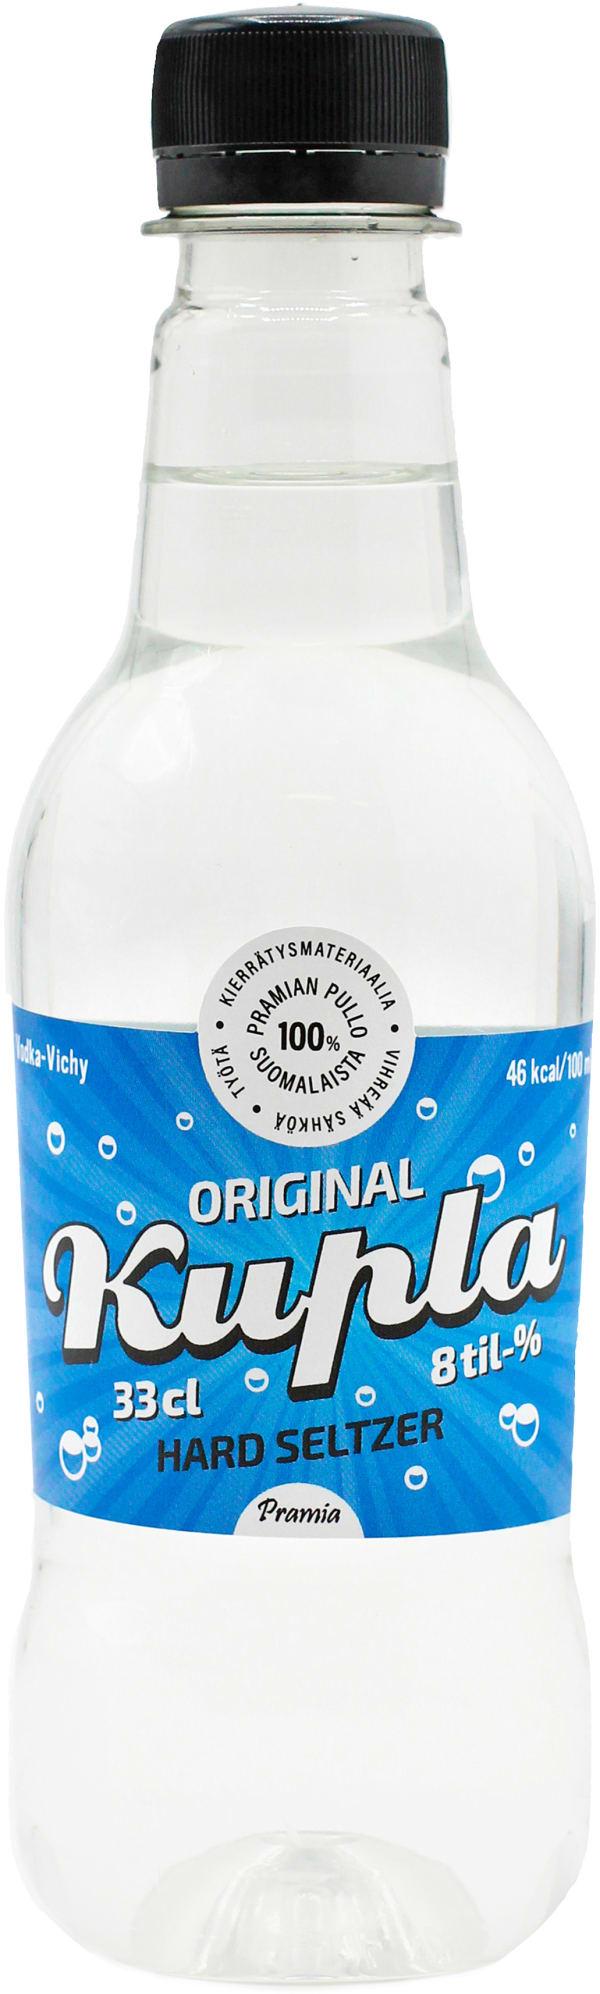 Pramia Kupla Maustamaton Lonkero plastic bottle